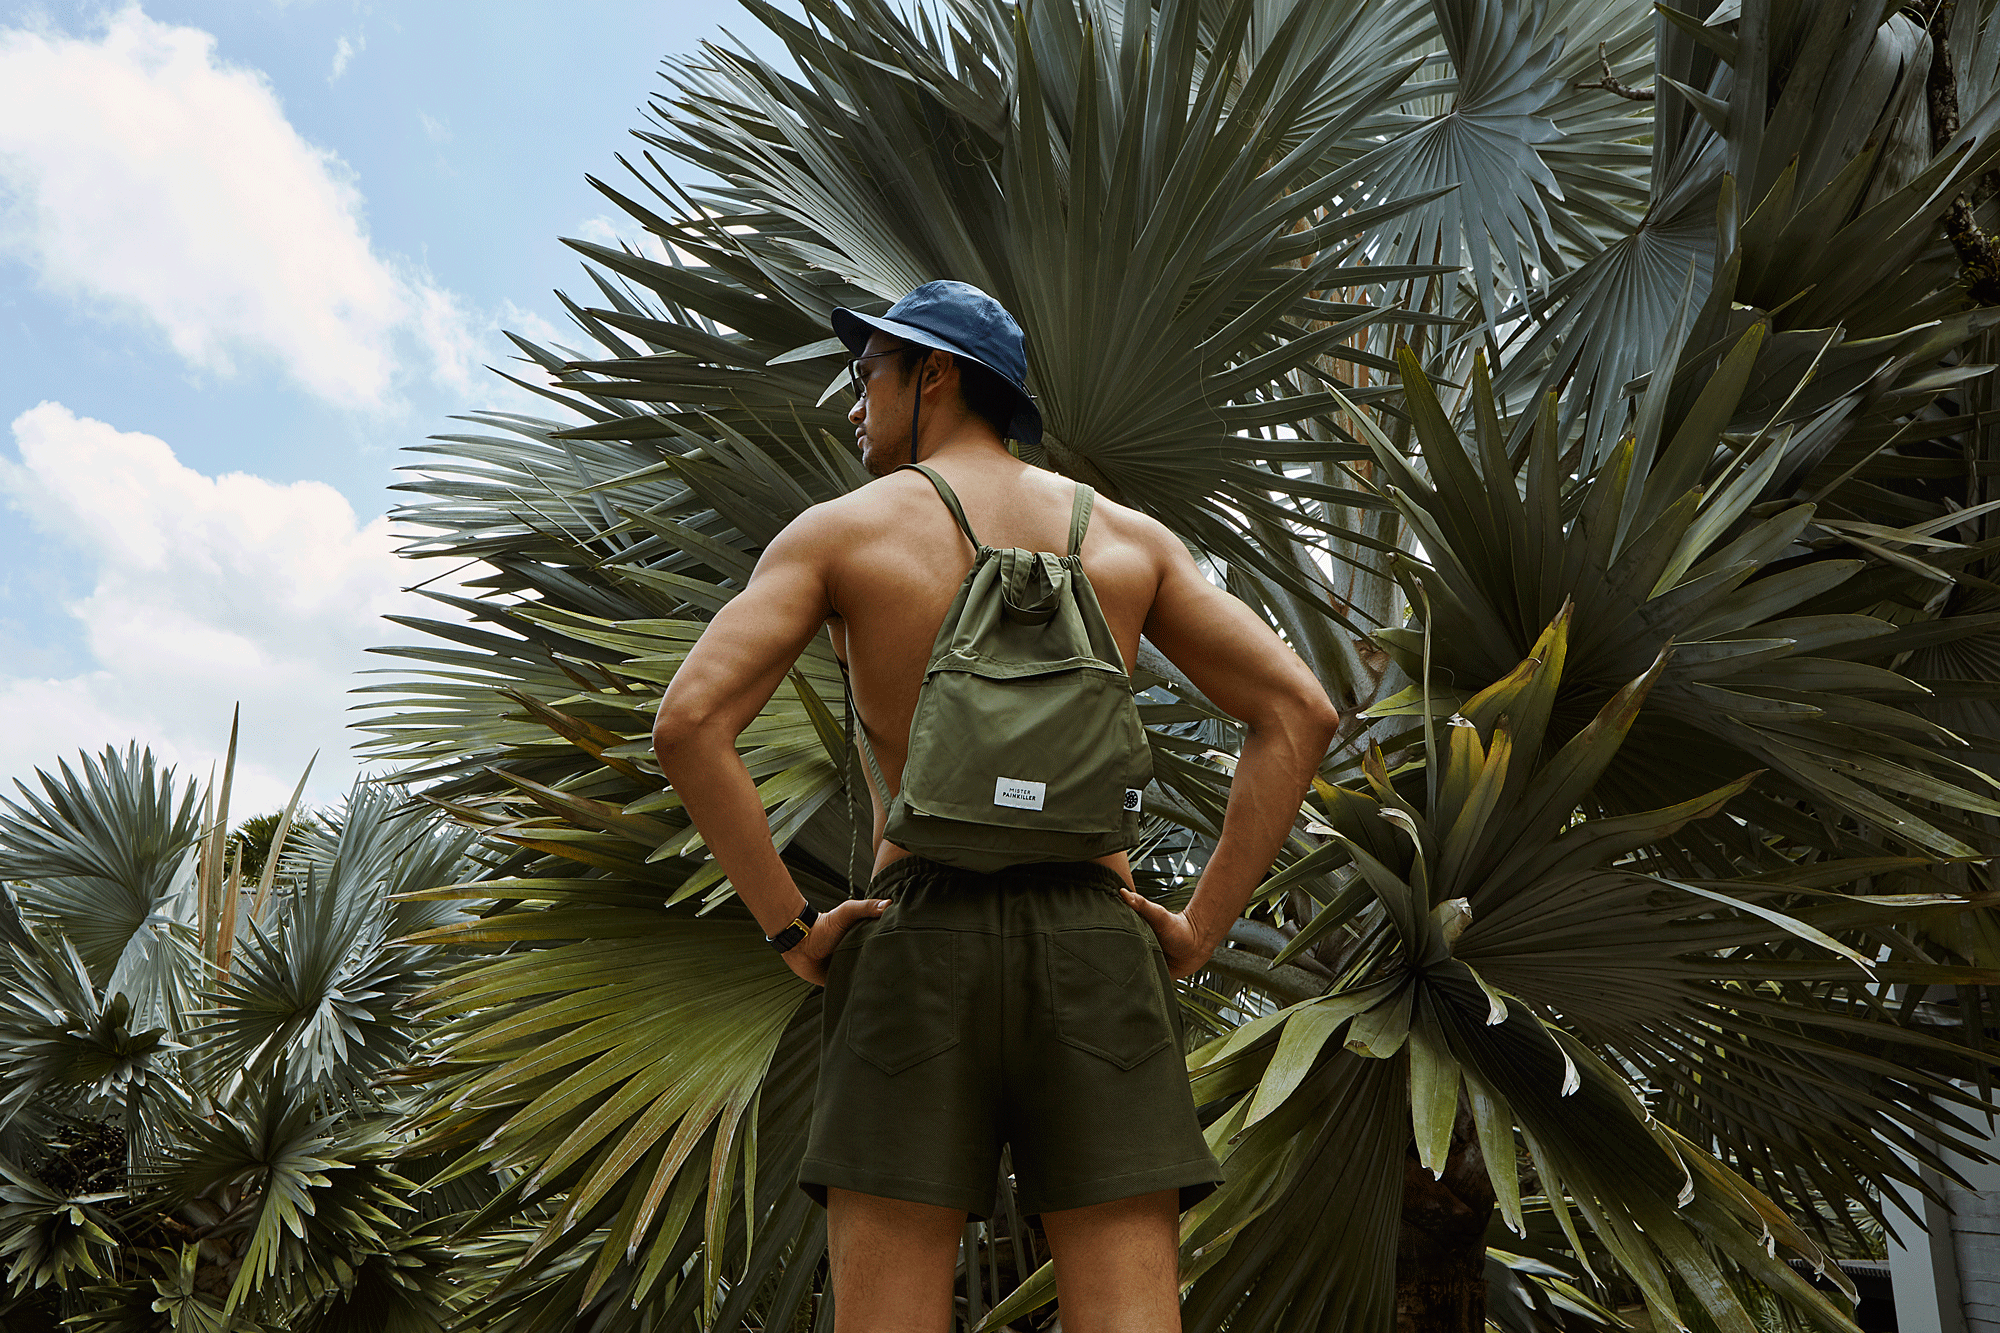 hat / bag / shorts : Painkiller / watch : FORREST / sunglasses : TAVAT